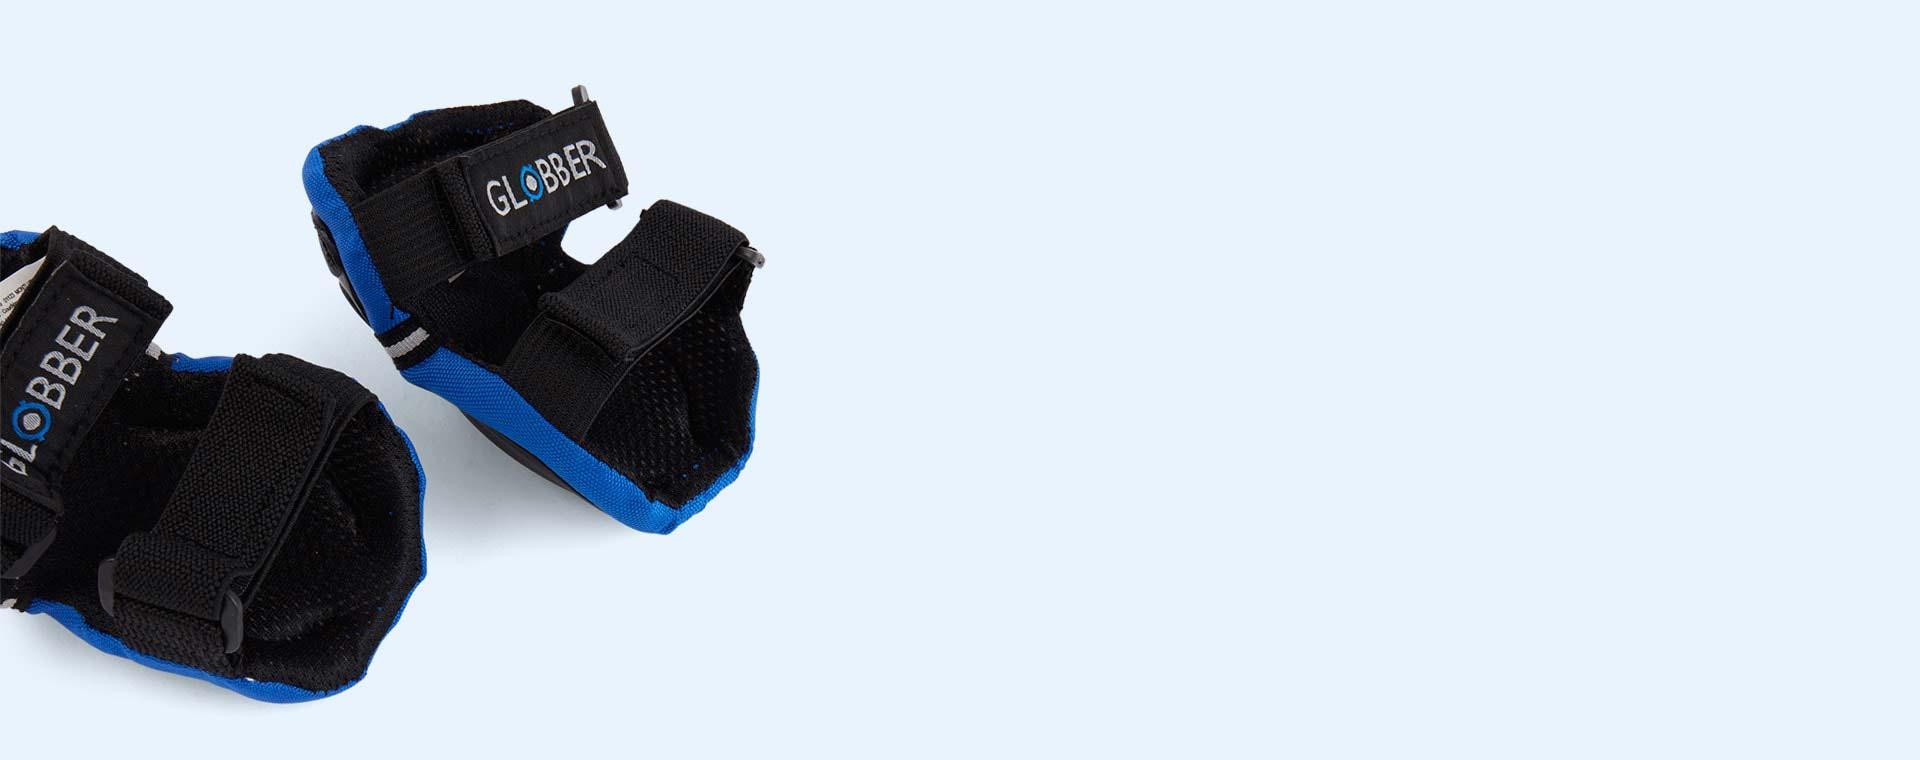 Navy Globber Junior Protective Pad Set